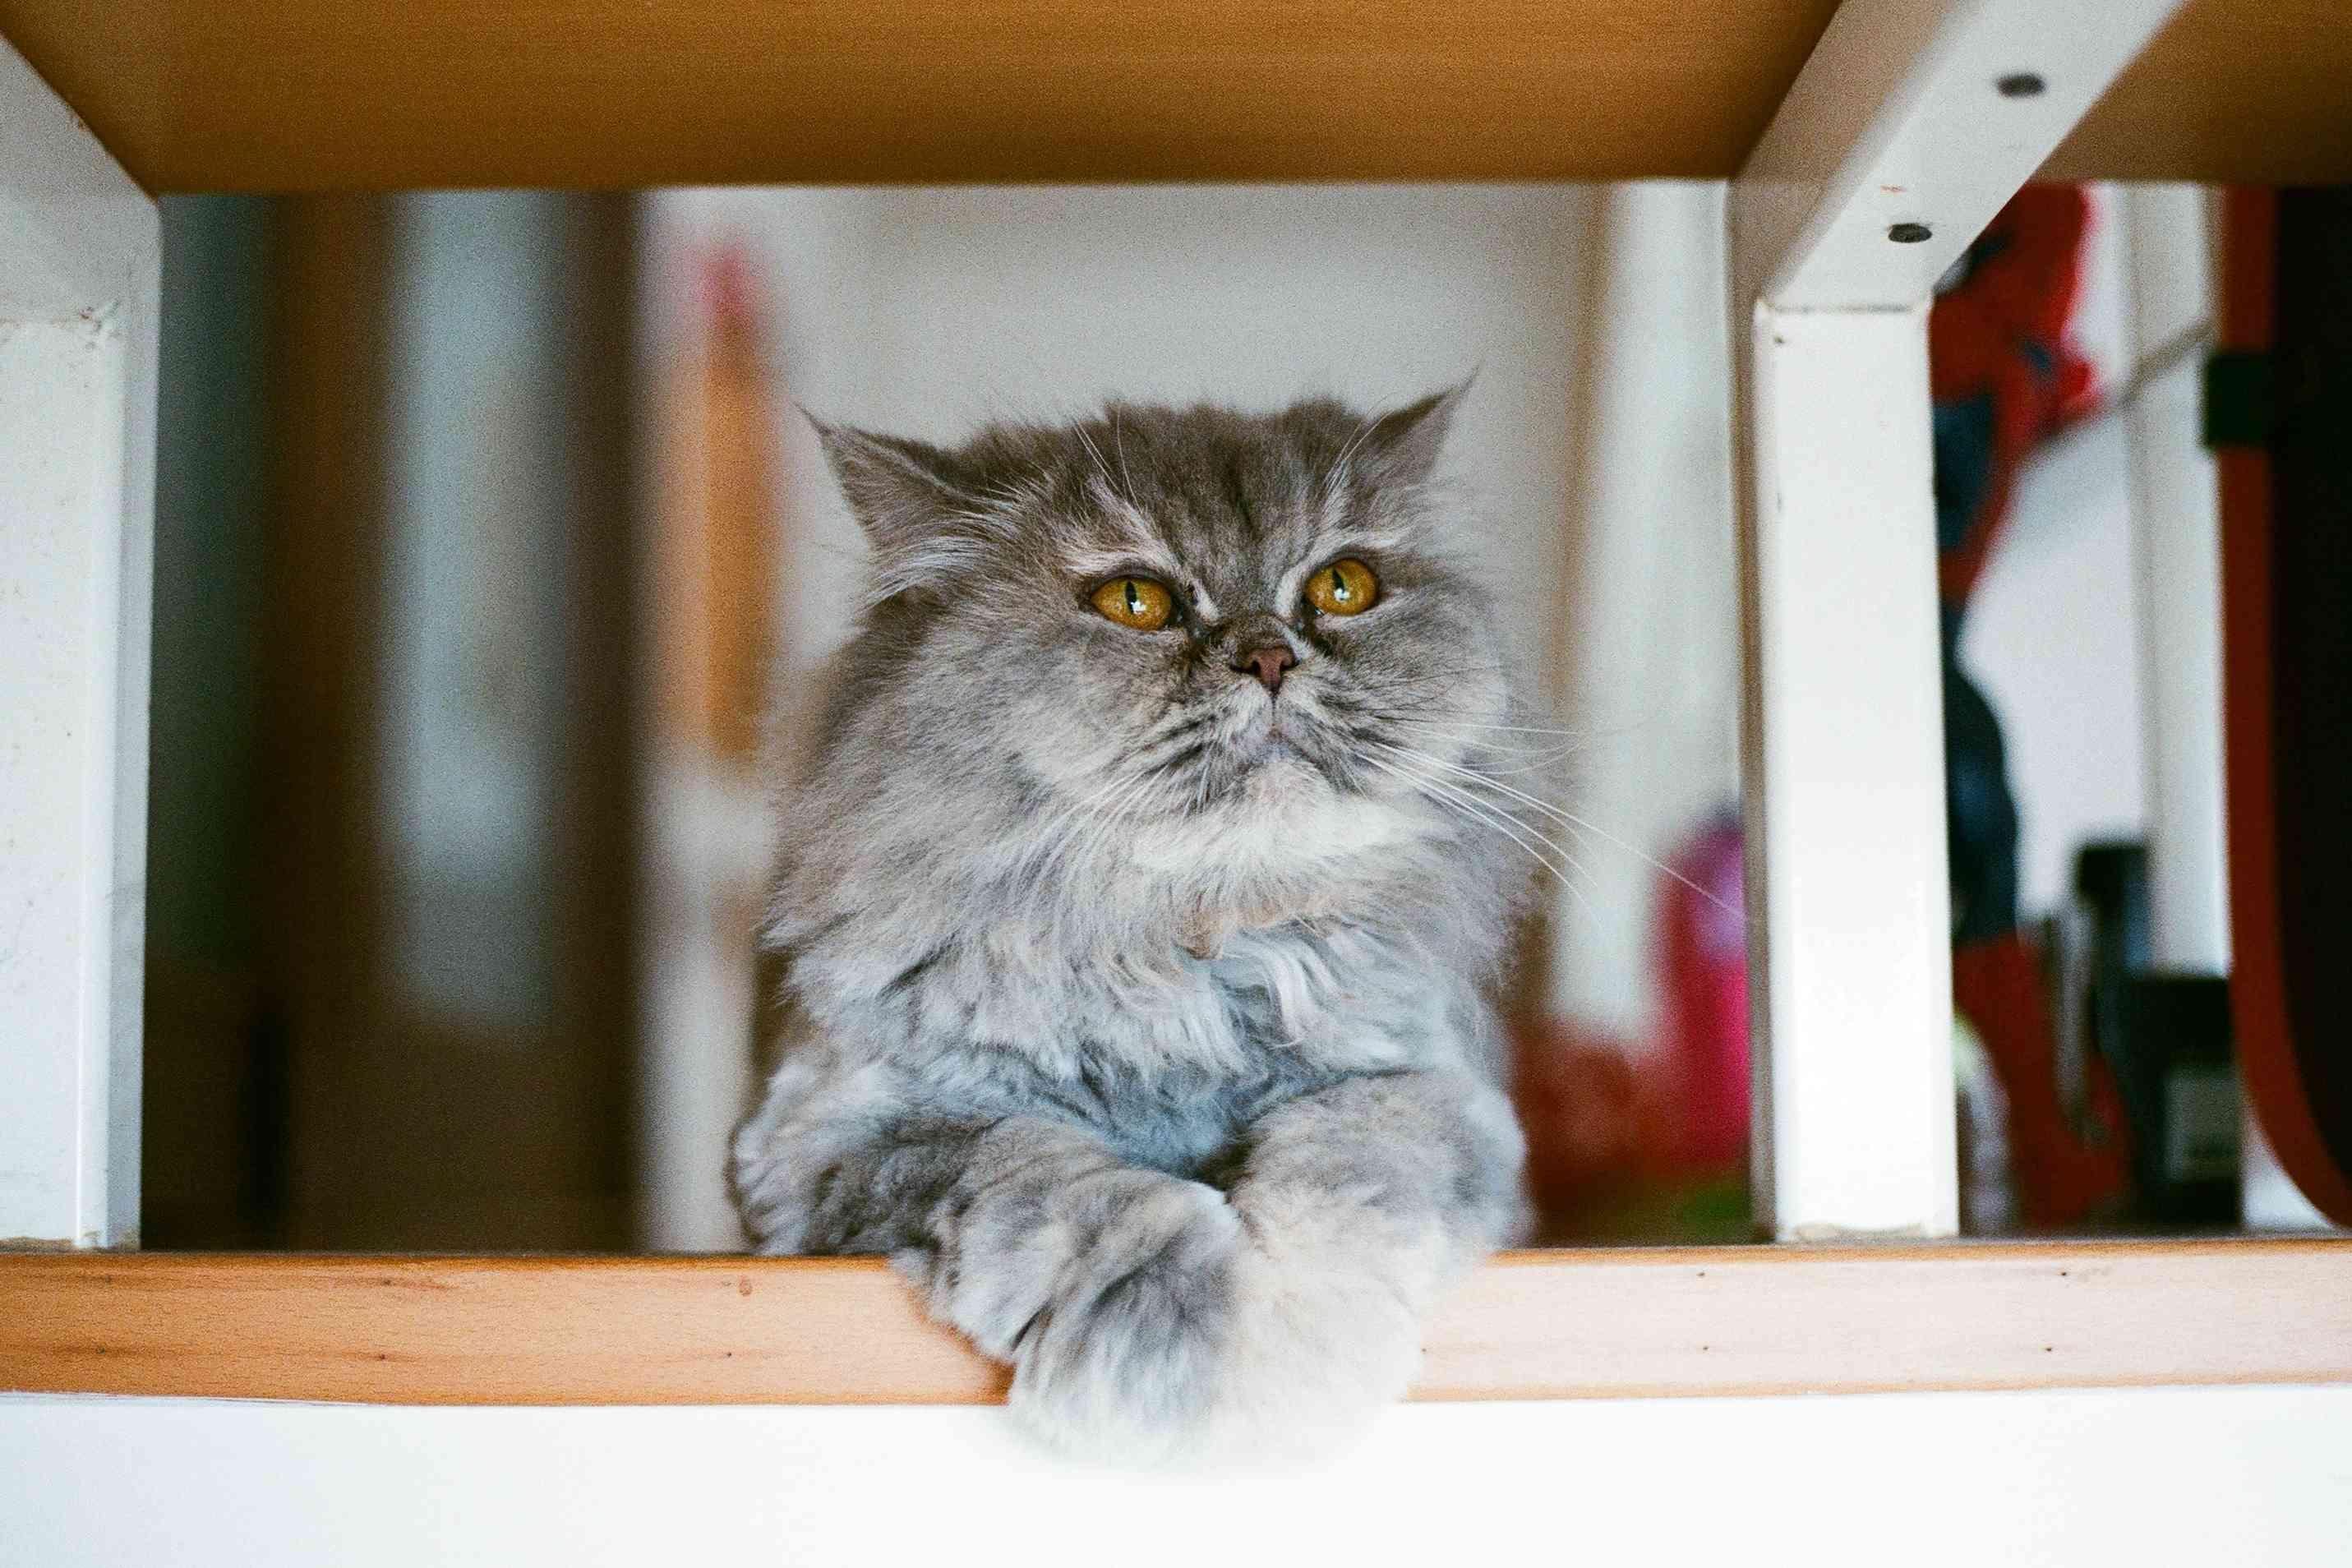 Gato persa gris atigrado sentado en estante